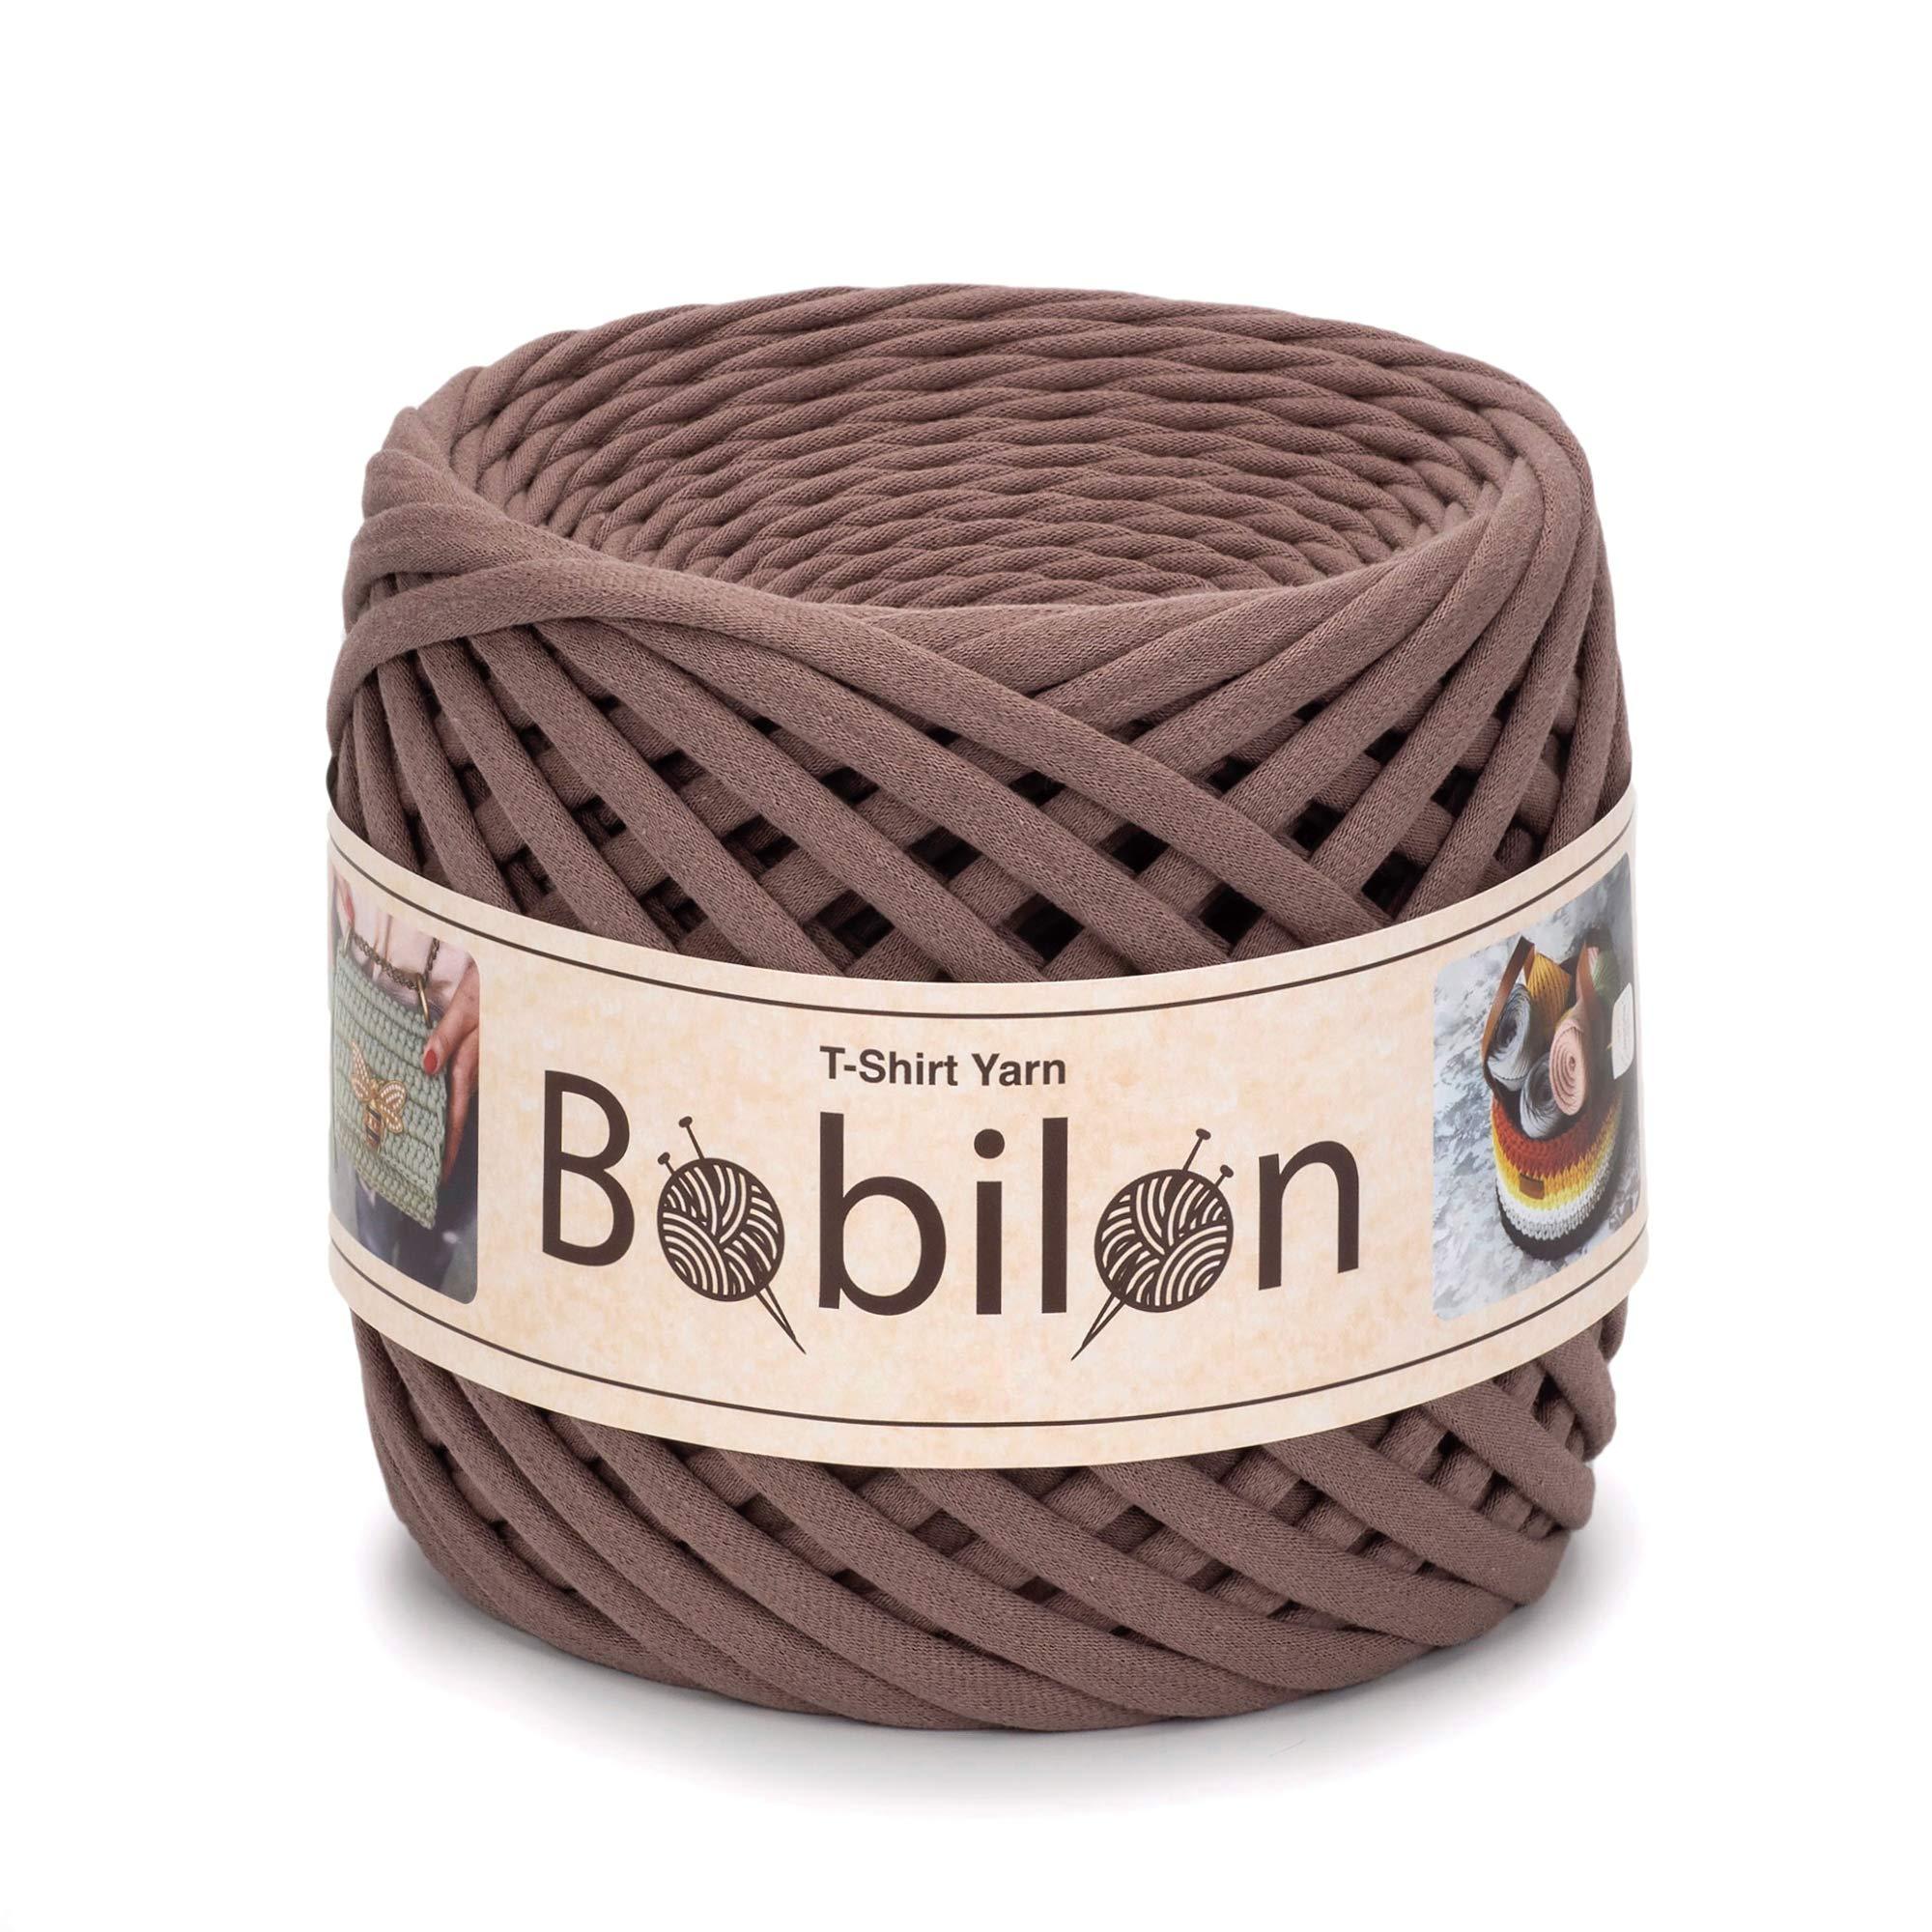 T-Shirt Yarn Fettuccini Zpagetti Style - Tshirt Yarn for Crocheting - Ribbon Yarn 100% Cotton - Knitting Yarn Ball - T Yarn Organic - Macrame T-Yarn - Thick Fabric Yarn - Jersey Yarn Cocoa